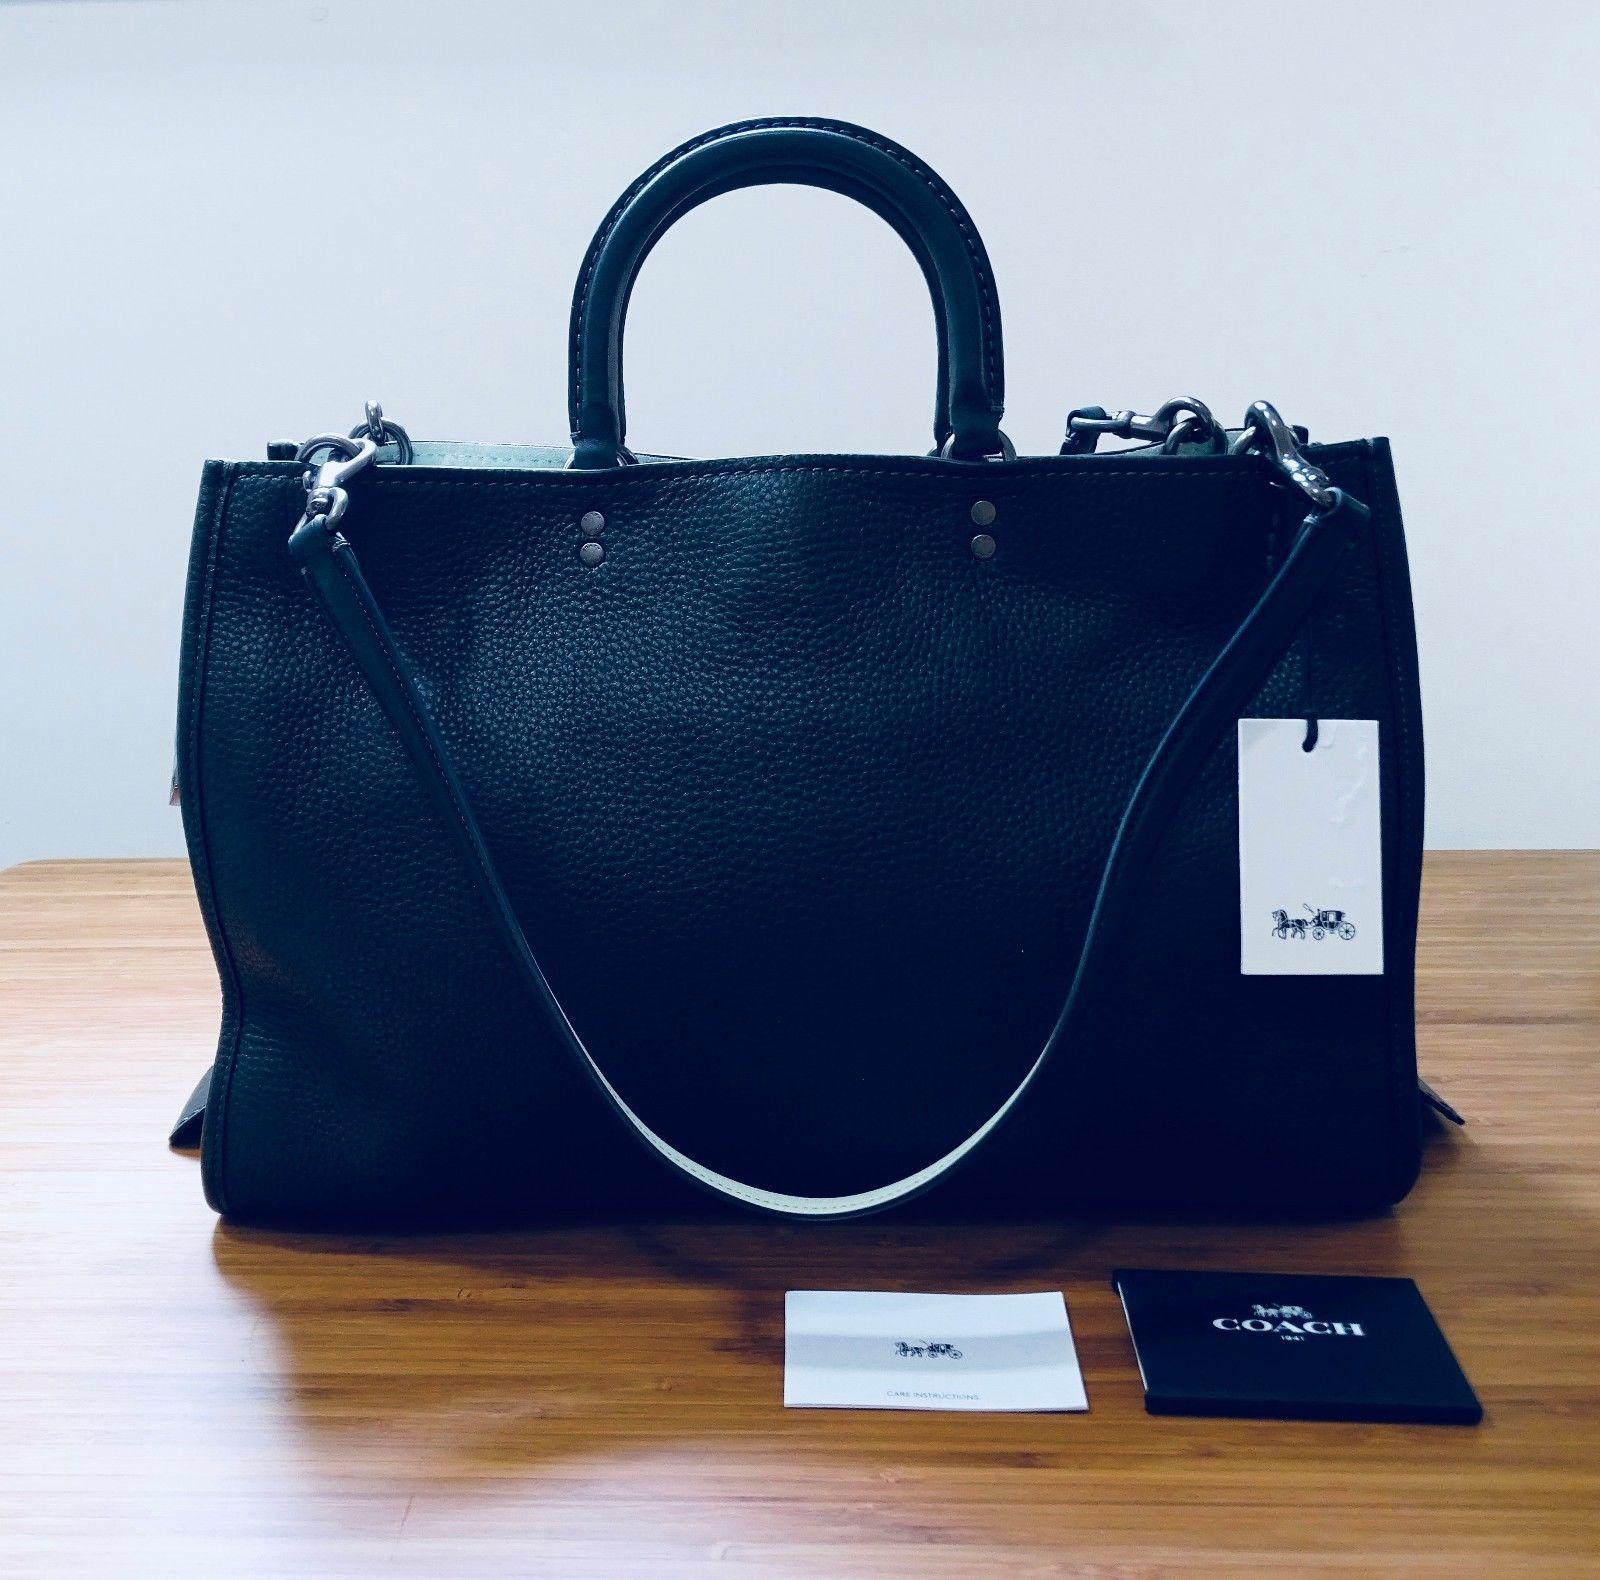 a5424efcb4a4 Coach 1941 Pebble Leather Rogue 39 Ivy Green with Black Copper Hardware  #coach #coachbags #coachhandbags